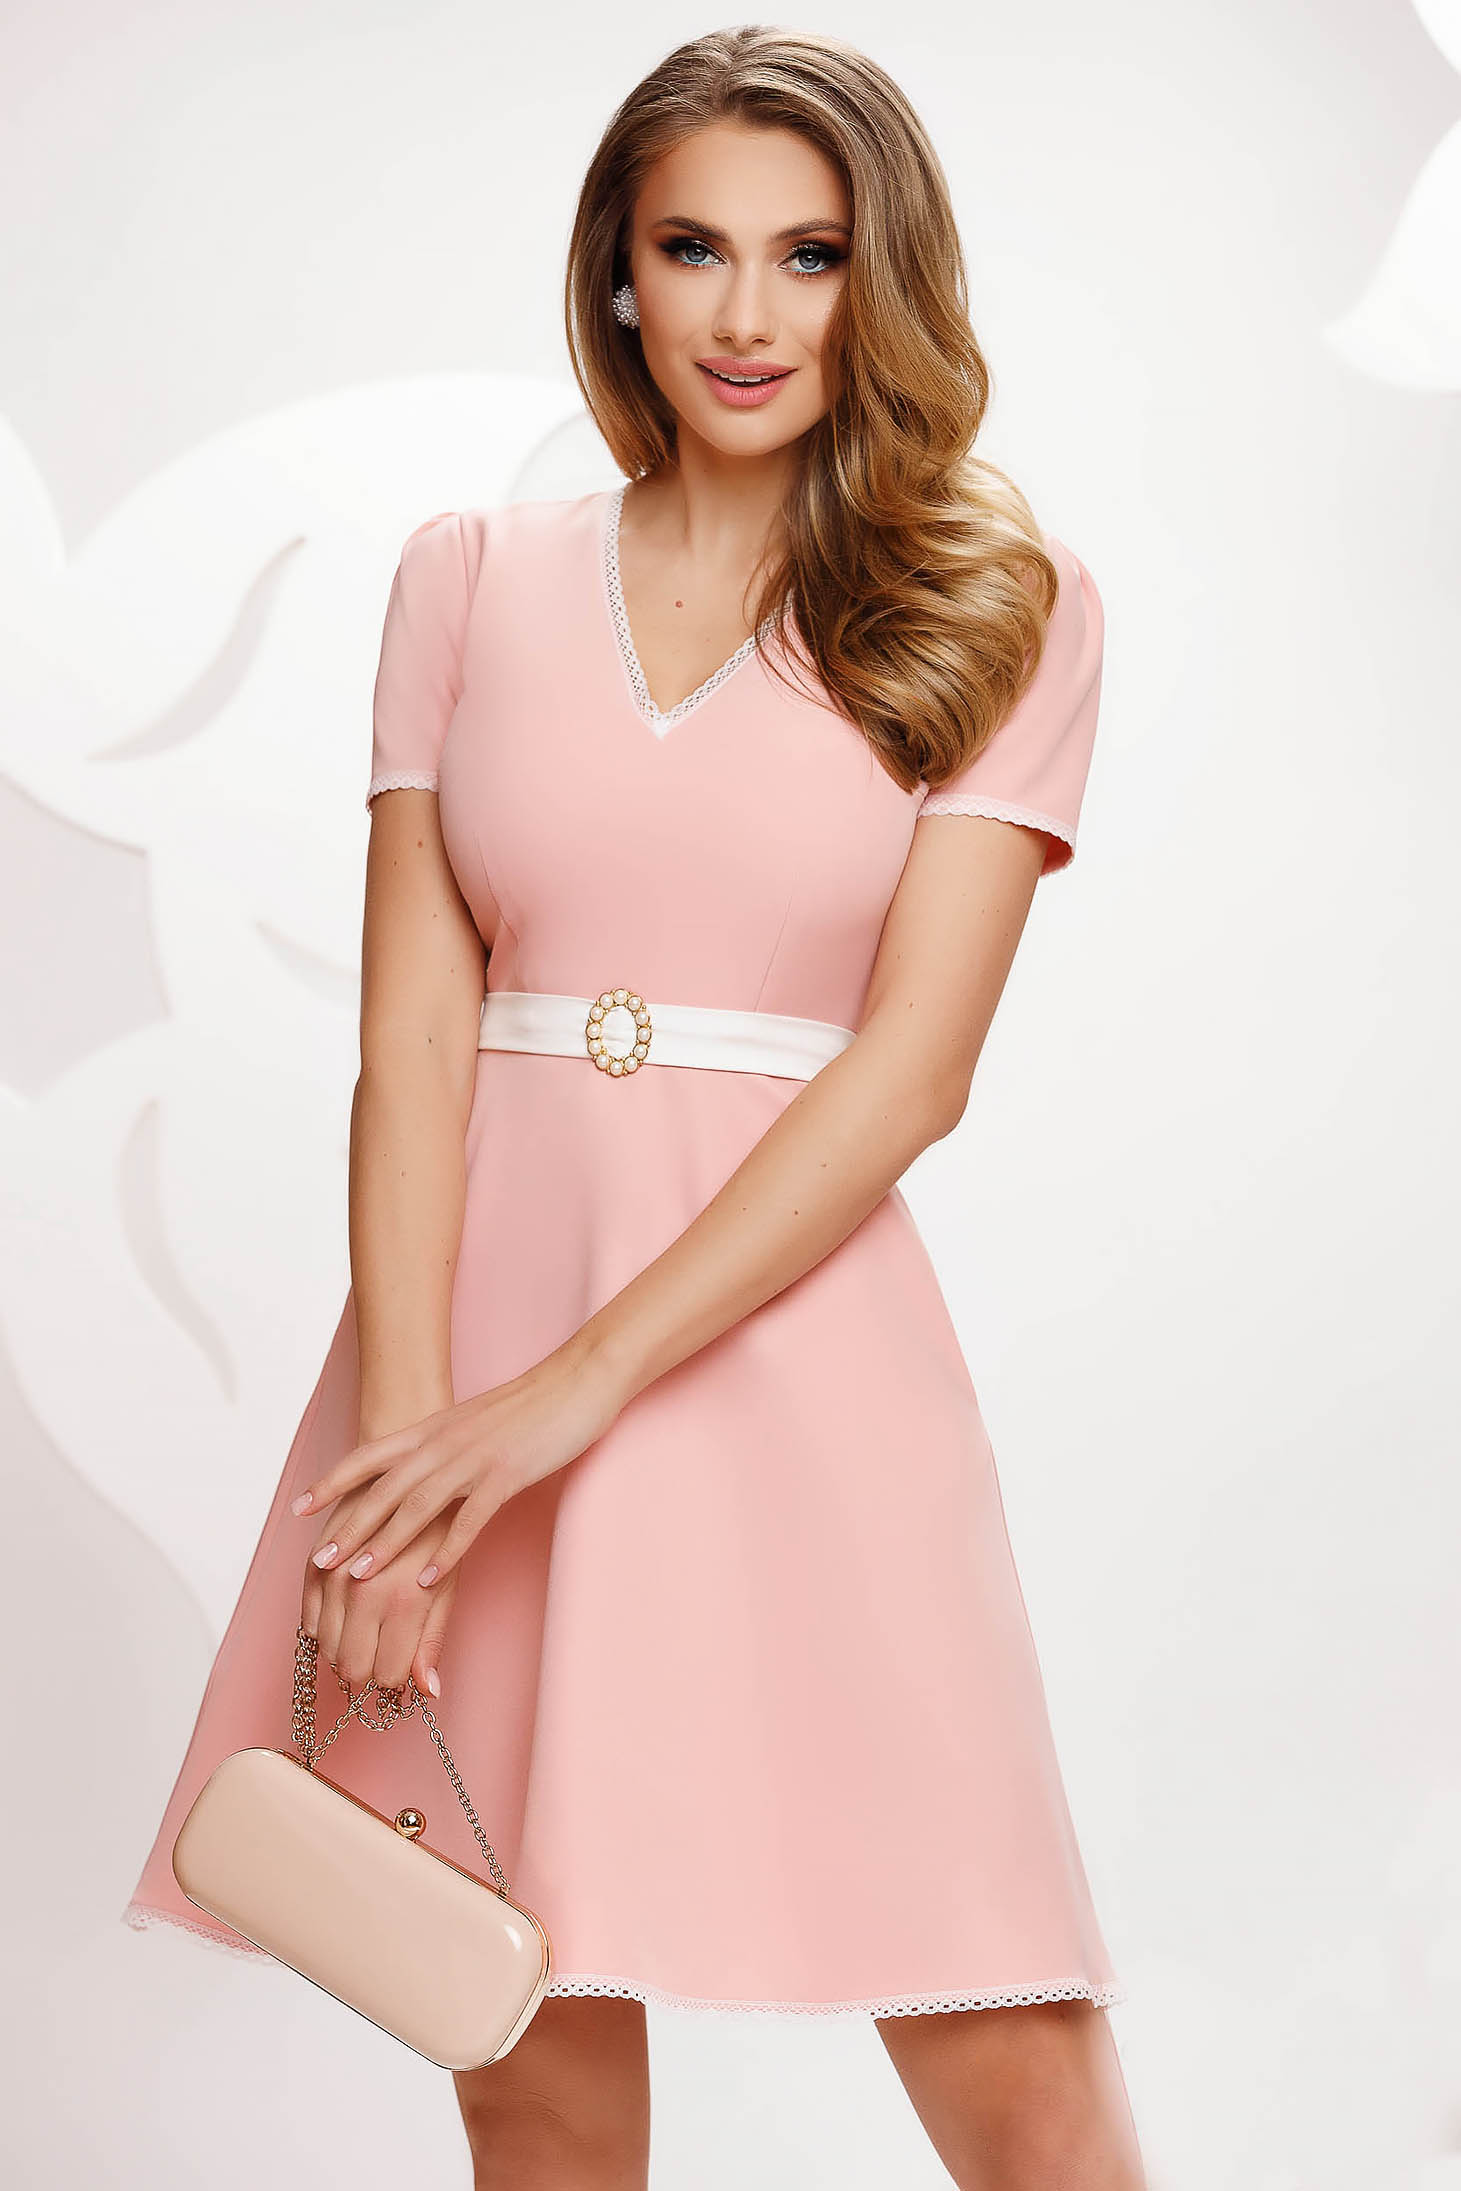 Rochie Fofy roz deschis scurta in clos din material usor elastic cu aplicatii de dantela cu buzunare